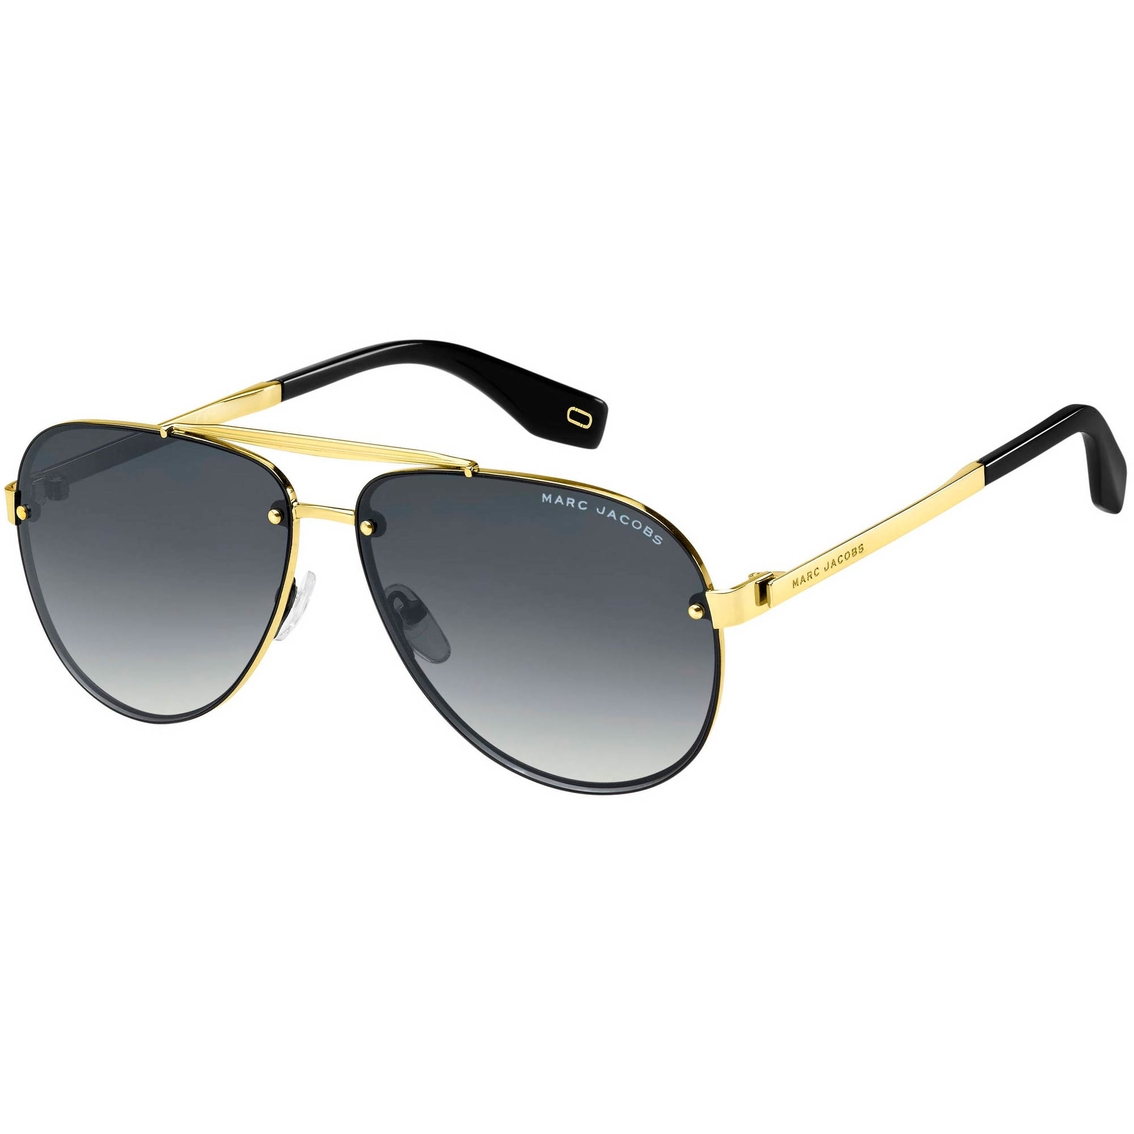 2a05bebcf450 Marc Jacobs Aviators Sunglasses